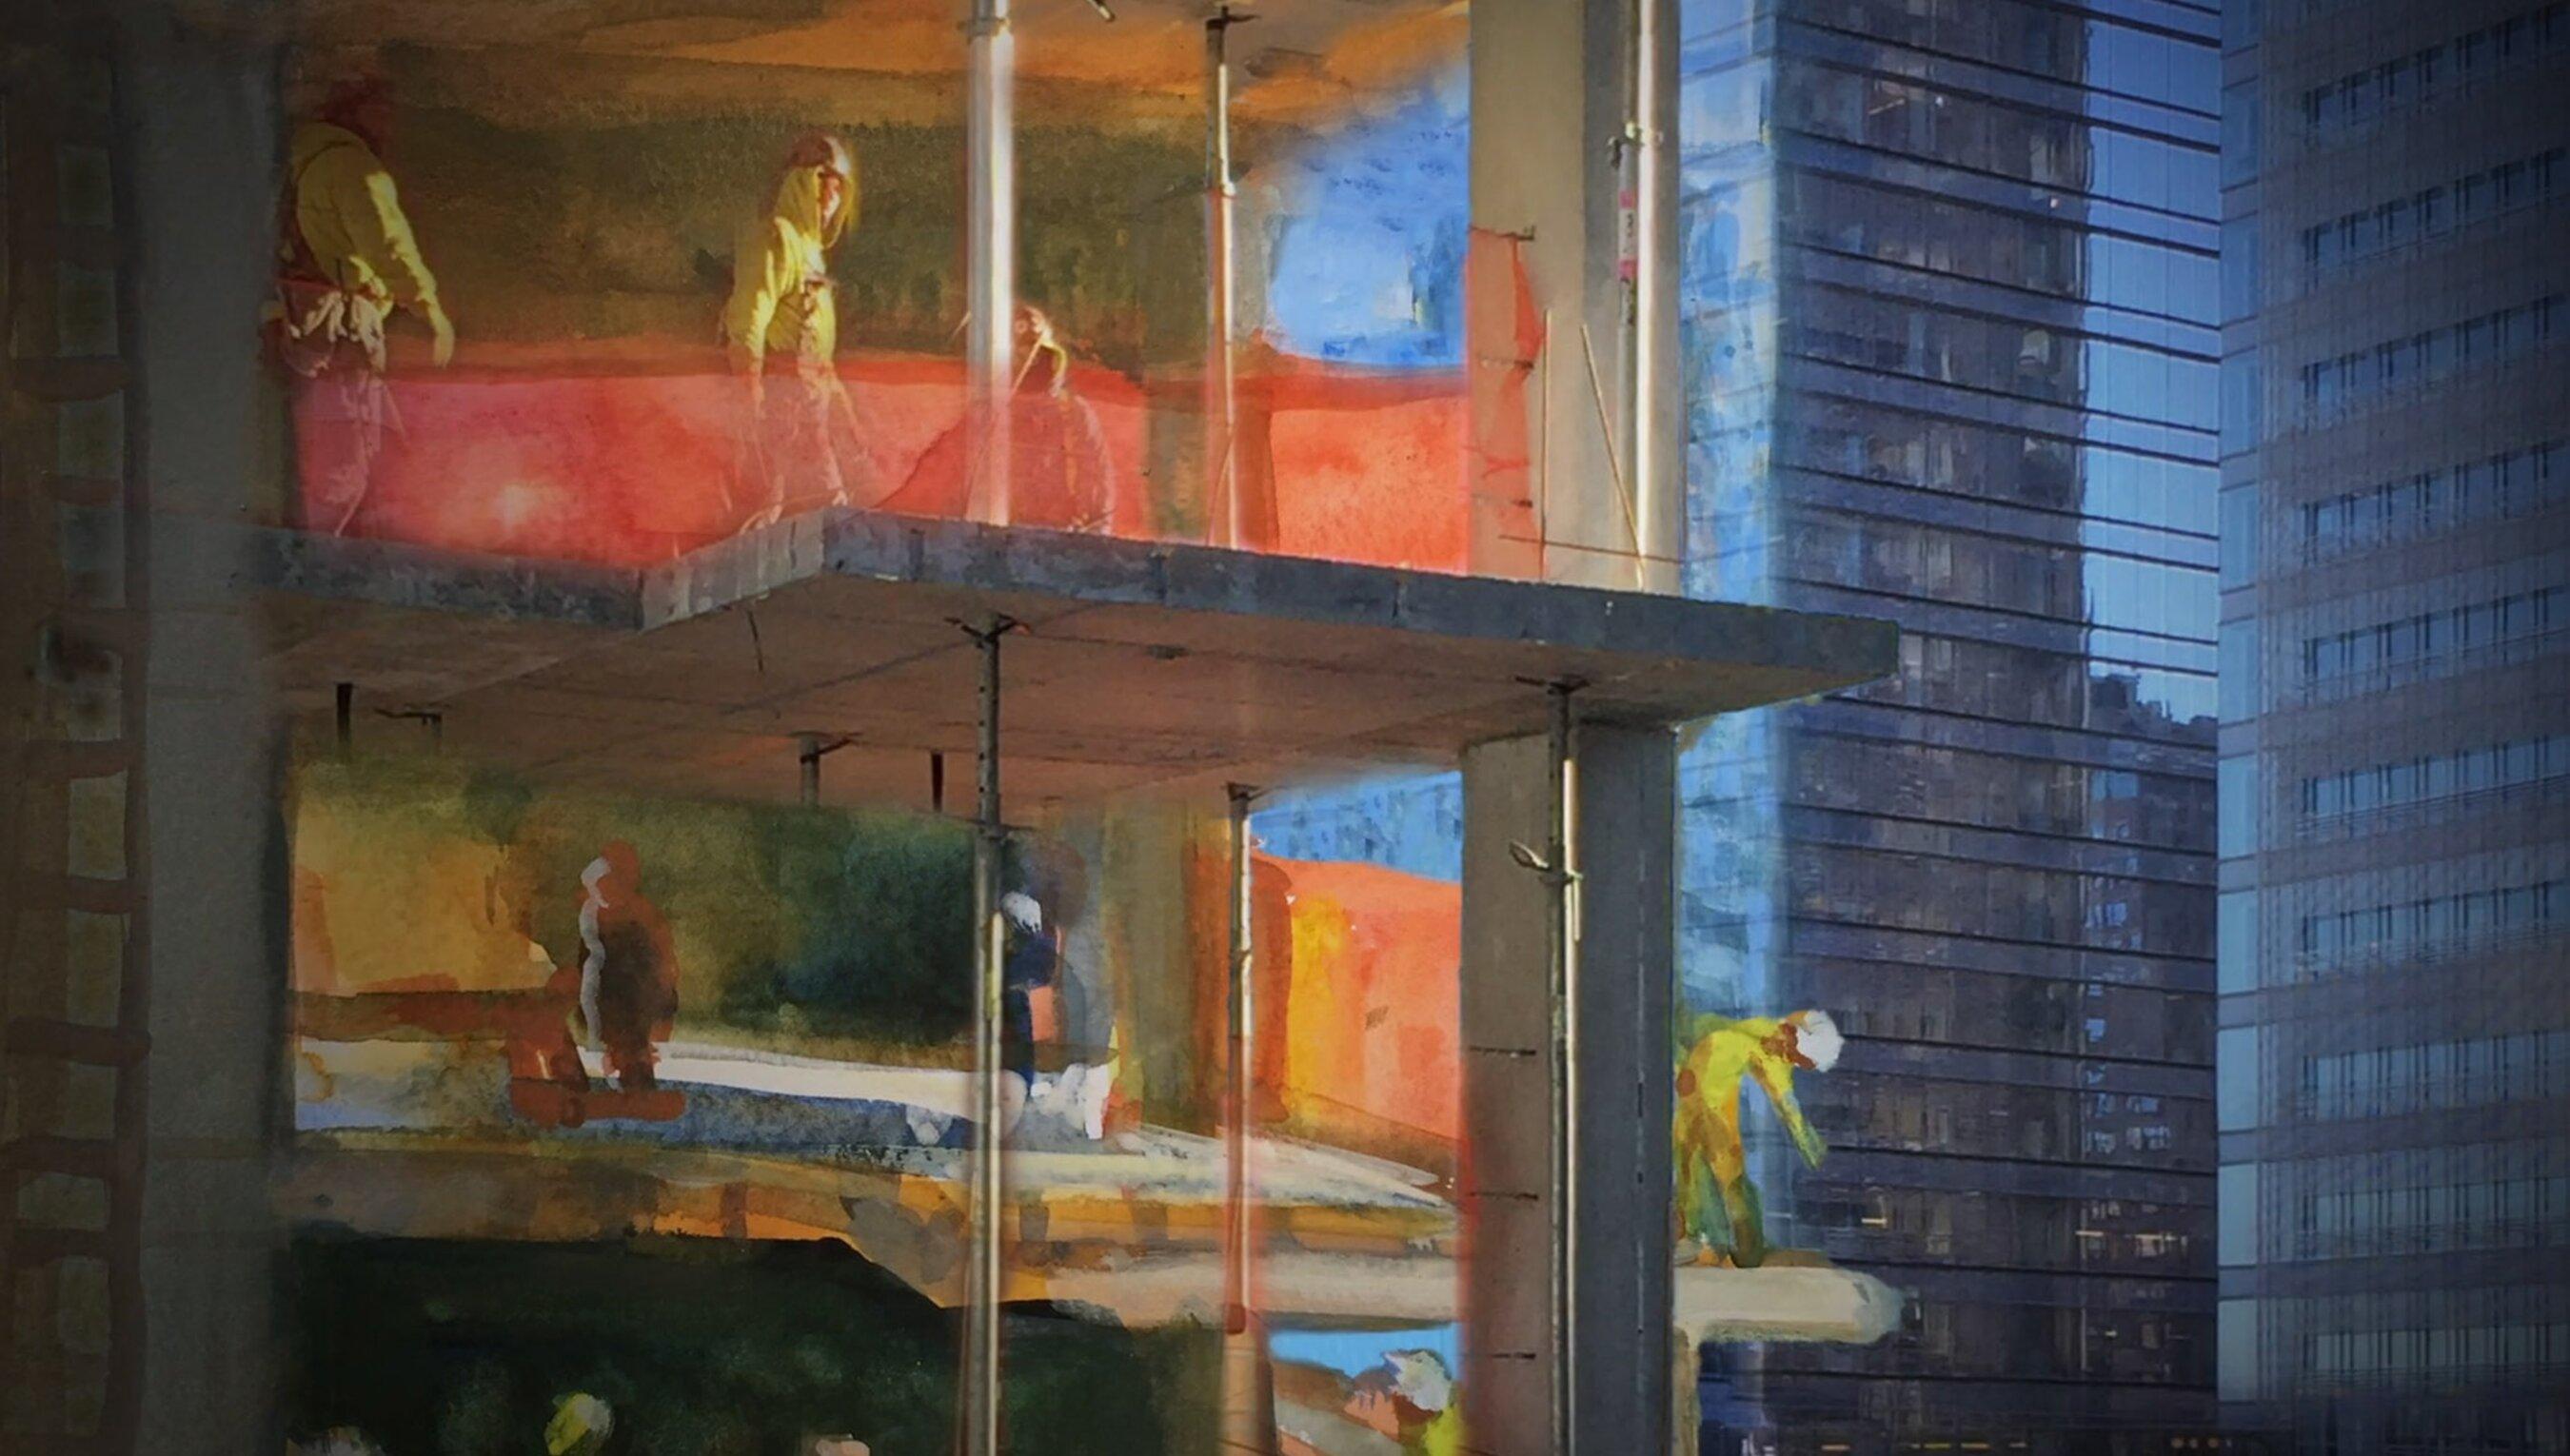 The monolith | Psyche